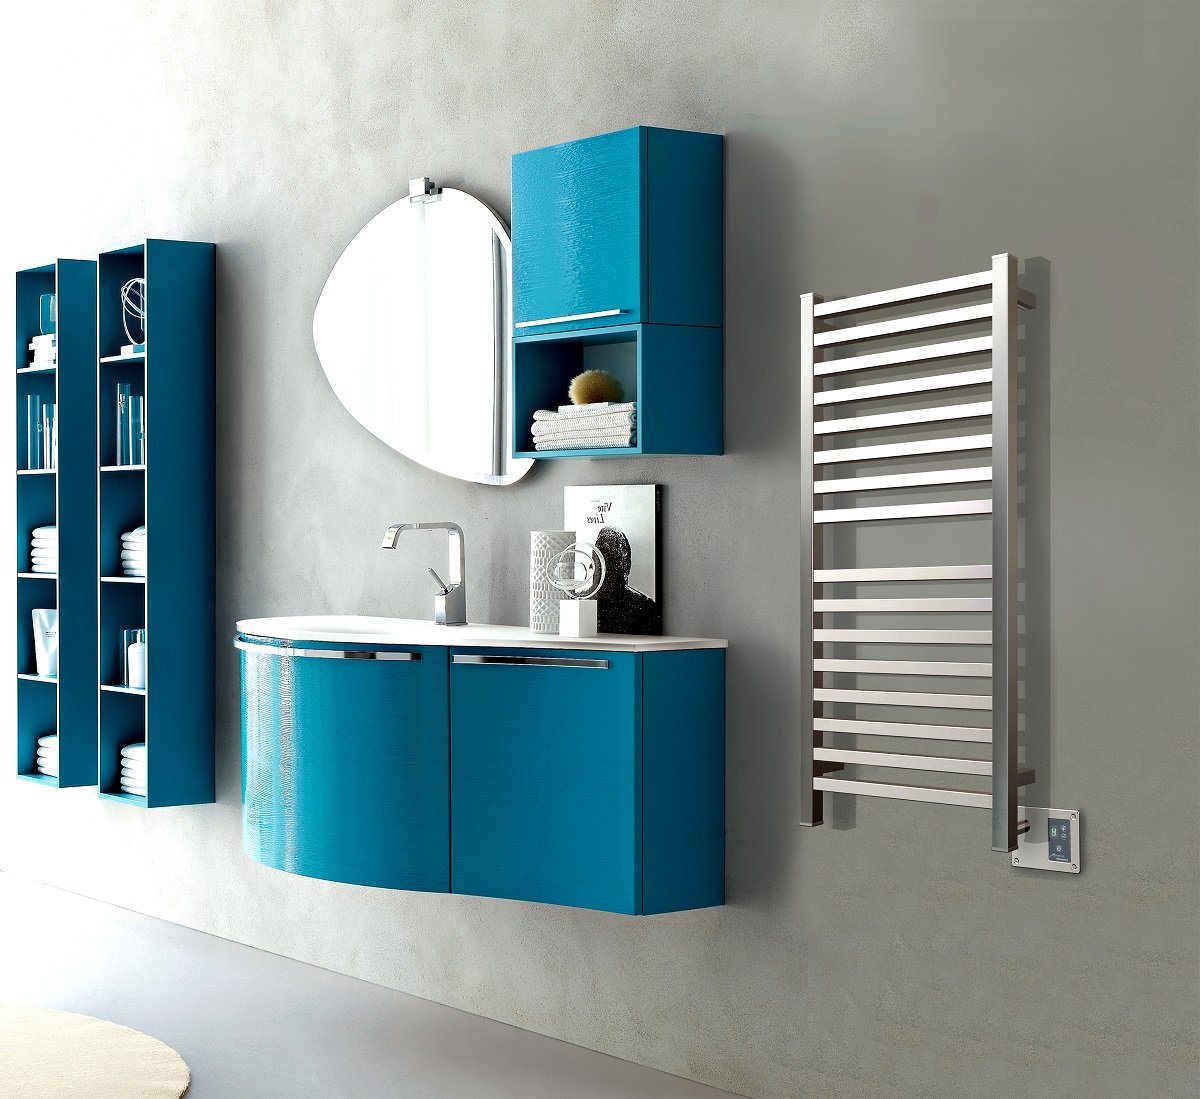 Amazon.com: Amba Q 2042 P Quadro 20-1/2-Inch x 42-Inch Towel ... - Amazon.com: Amba Q 2042 P Quadro 20-1/2-Inch x 42-Inch Towel Warmer,  Polished: Home Improvement